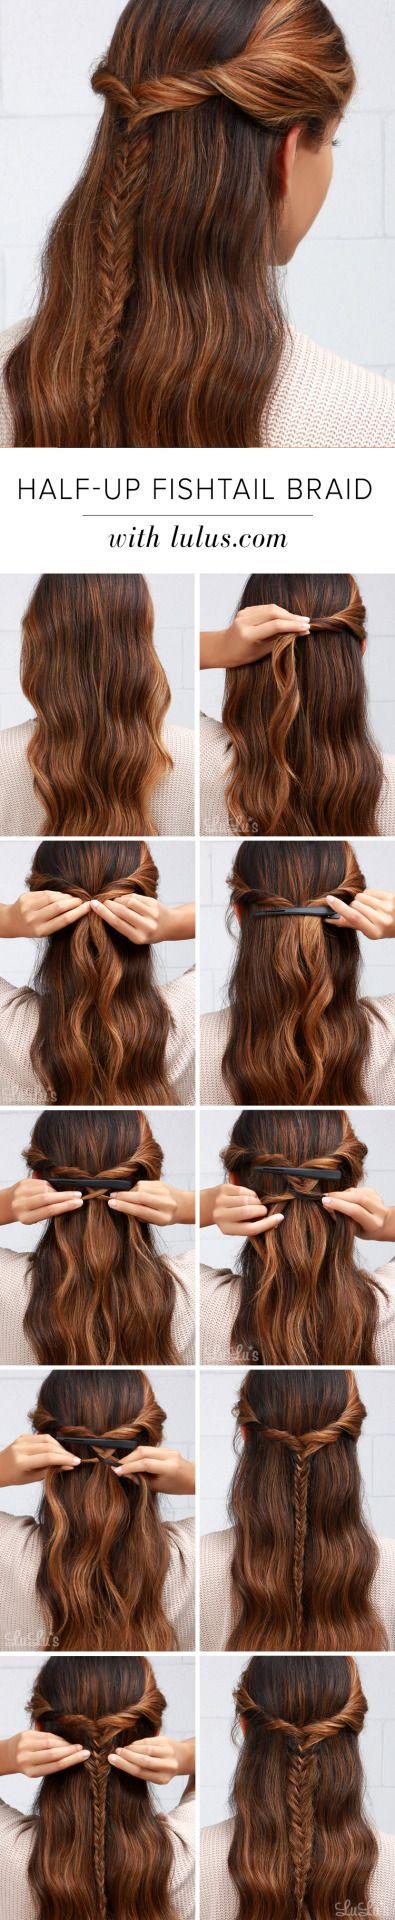 LuLu*s How-To: Half-Up Fishtail Braid